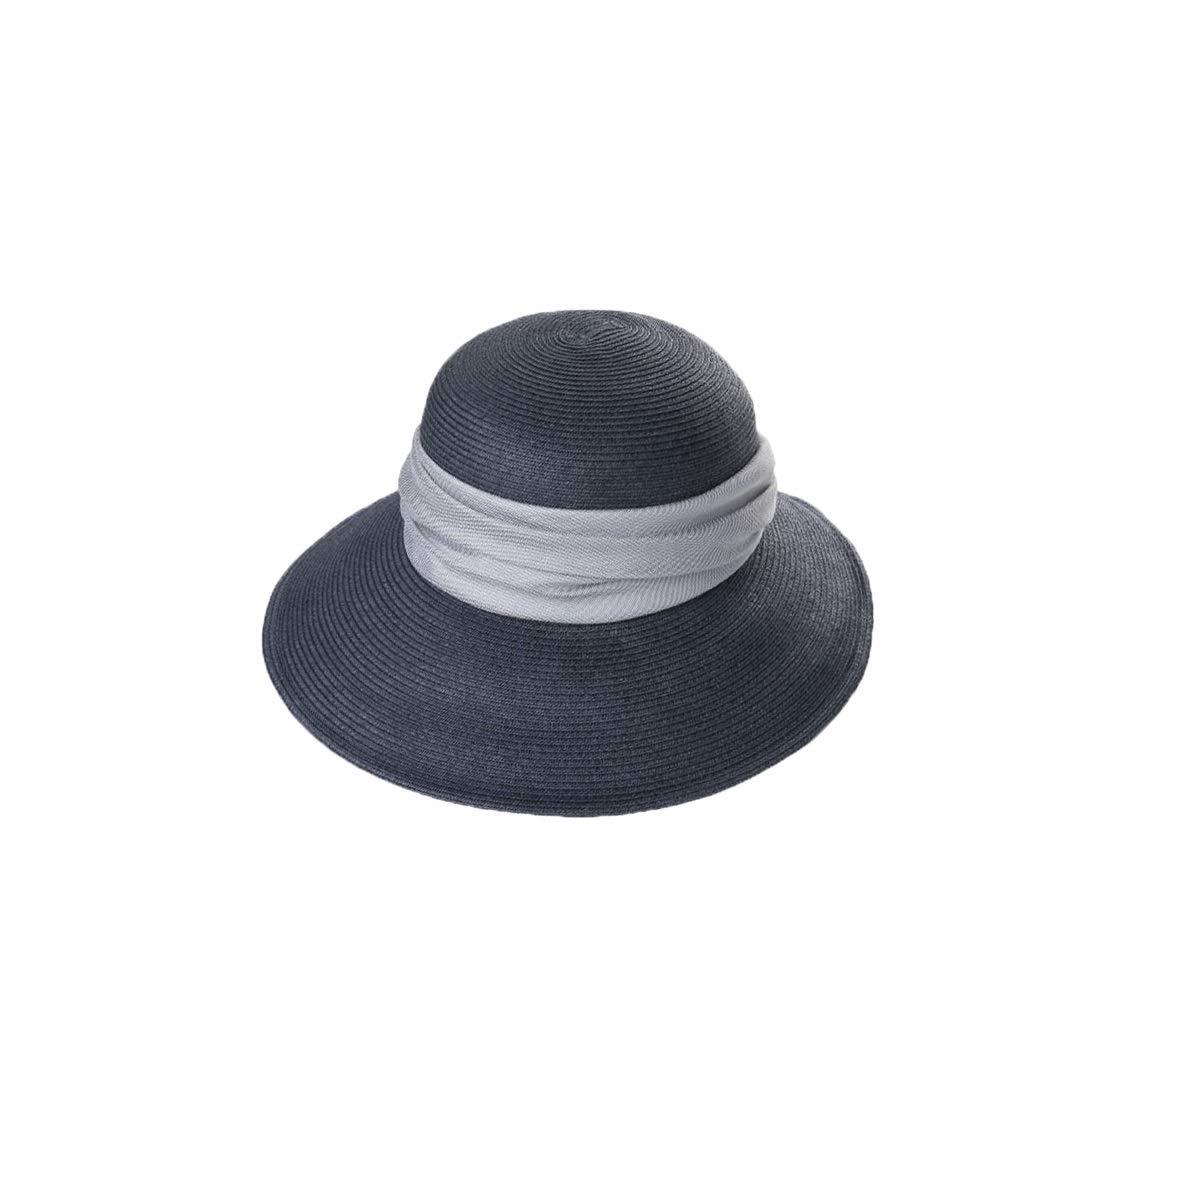 Zhongyue Hat Female Summer Straw Hat Wild Hat Visor Foldable Big Sunscreen Travel Beach Sun Hat, Beige, Dark Blue Summer hat (Color : Dark Blue)